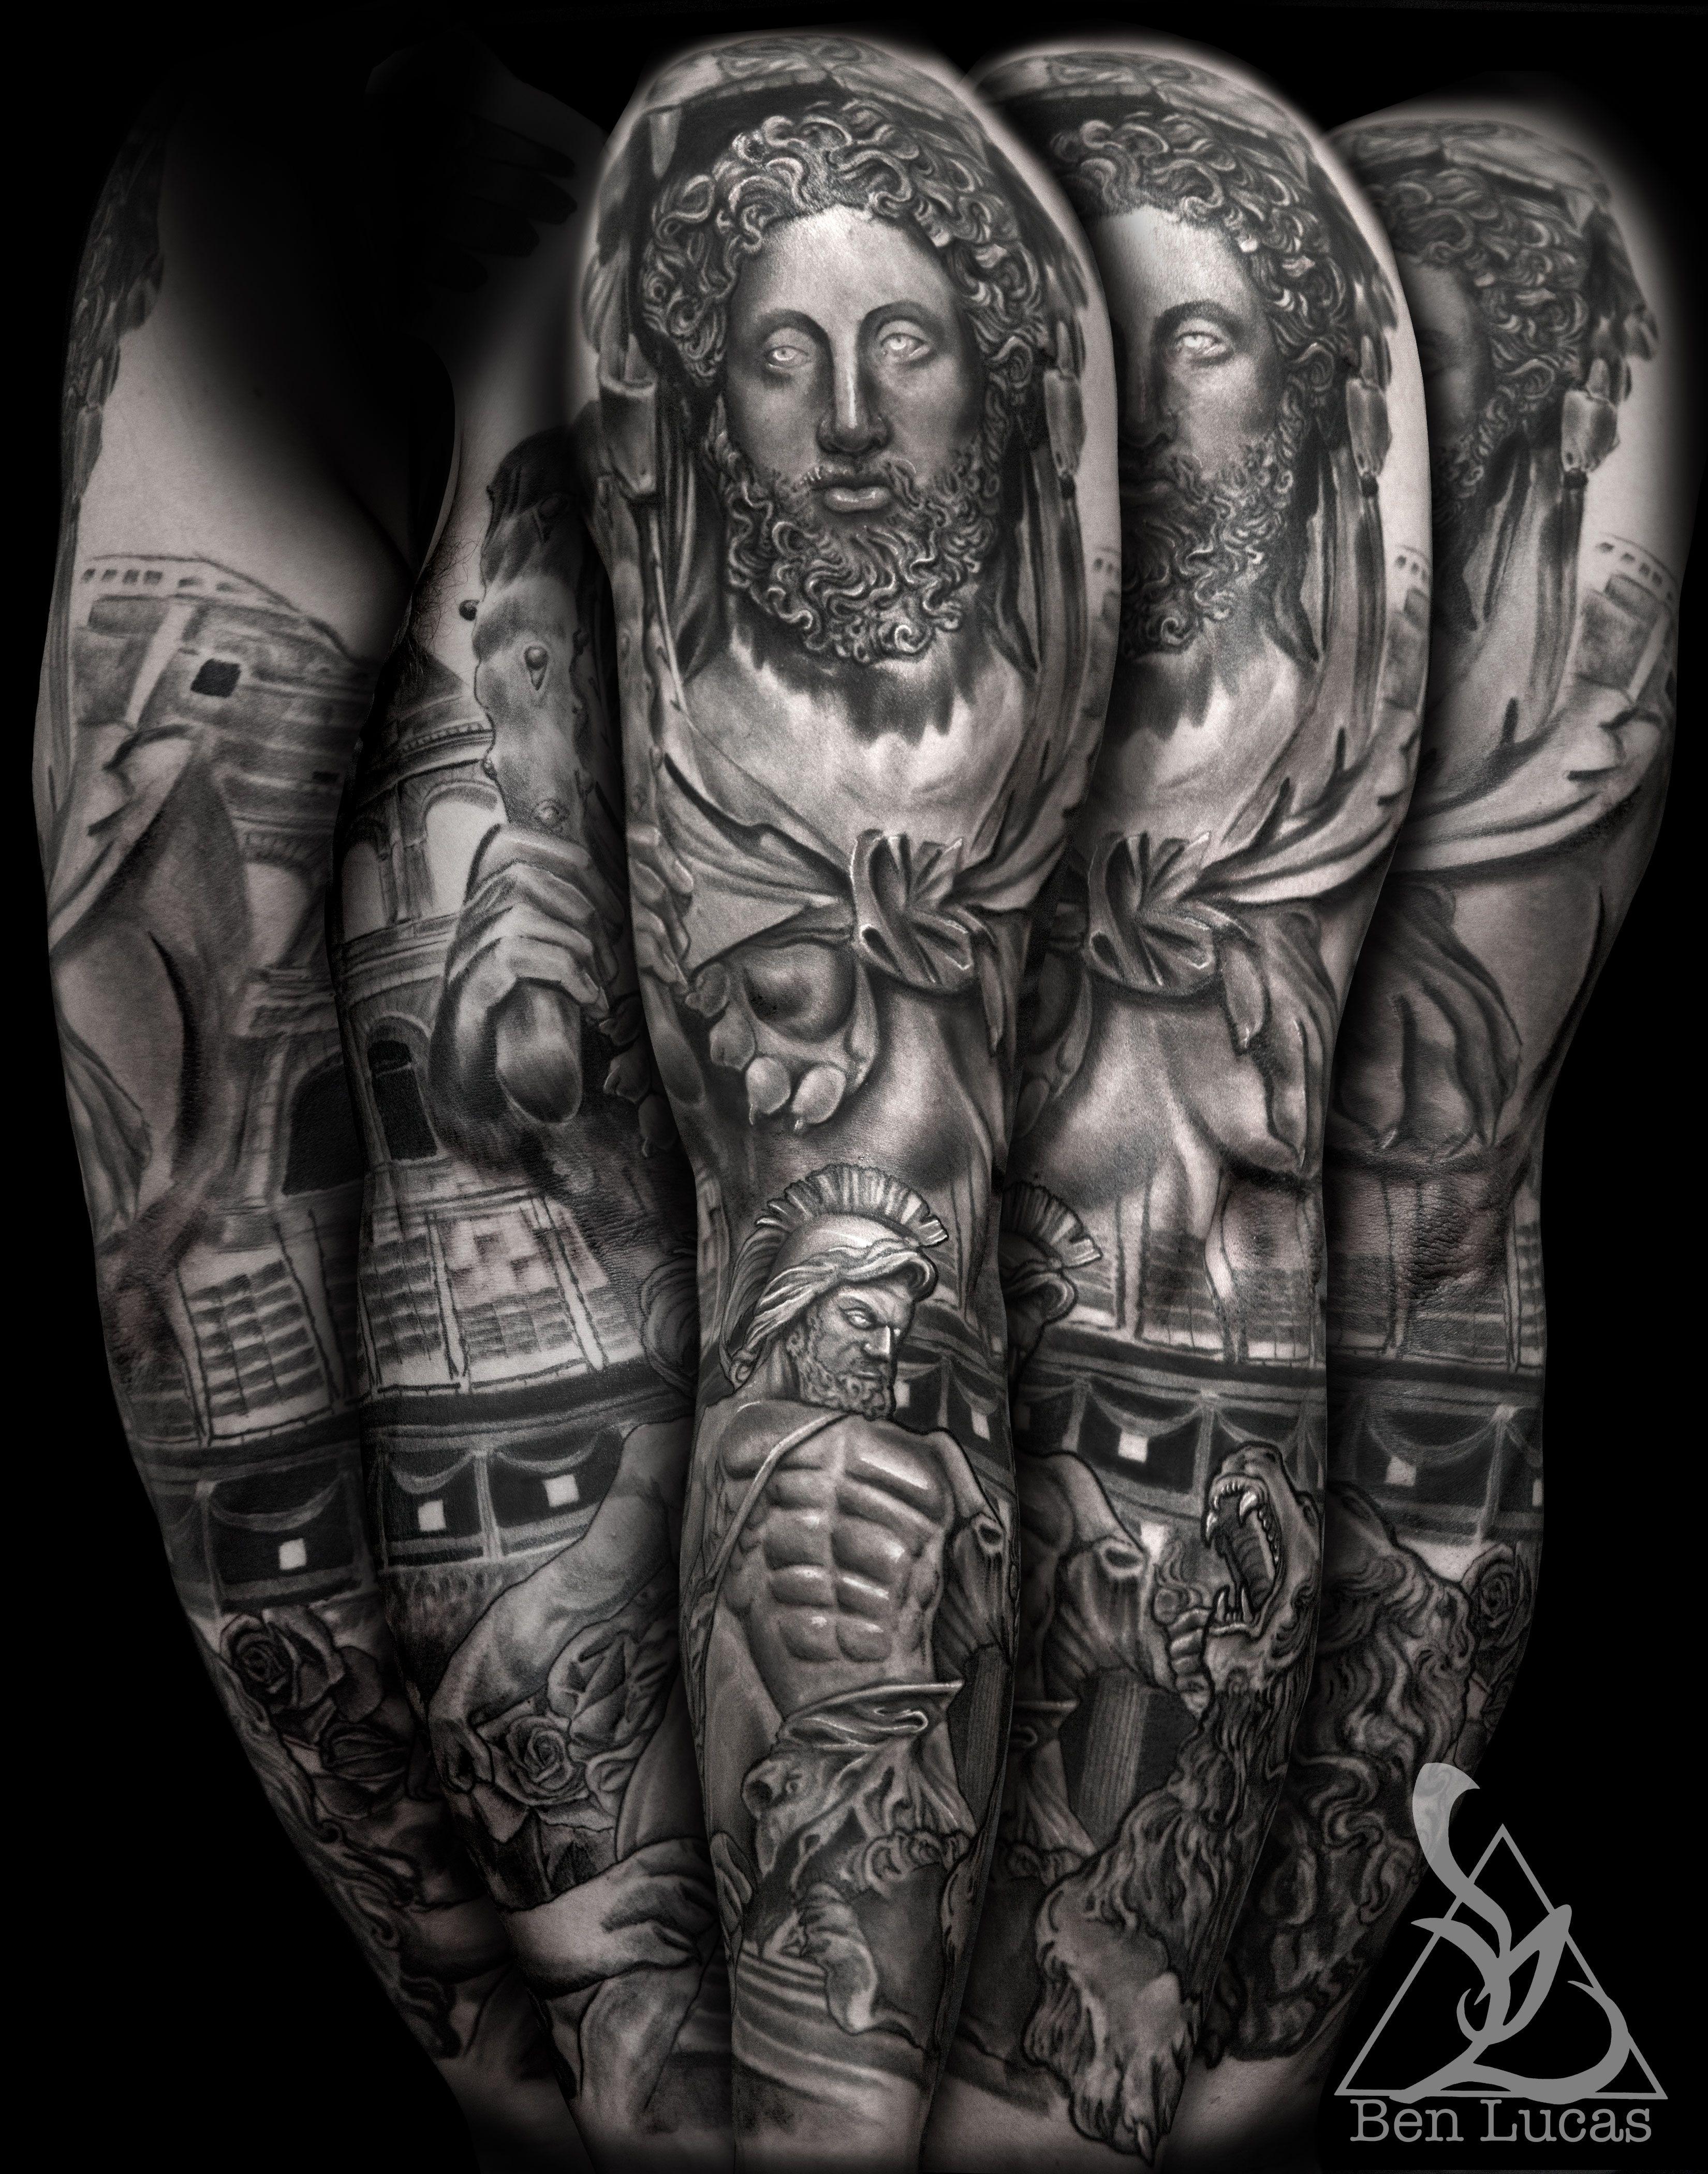 Catholic Tattoo Sleeve : catholic, tattoo, sleeve, Hercules, Gladiator, Coliseum, Fighting, Roman, Catholic, Statue, Sleeve, Tattoo., Tattoo,, Tattoo, Designs